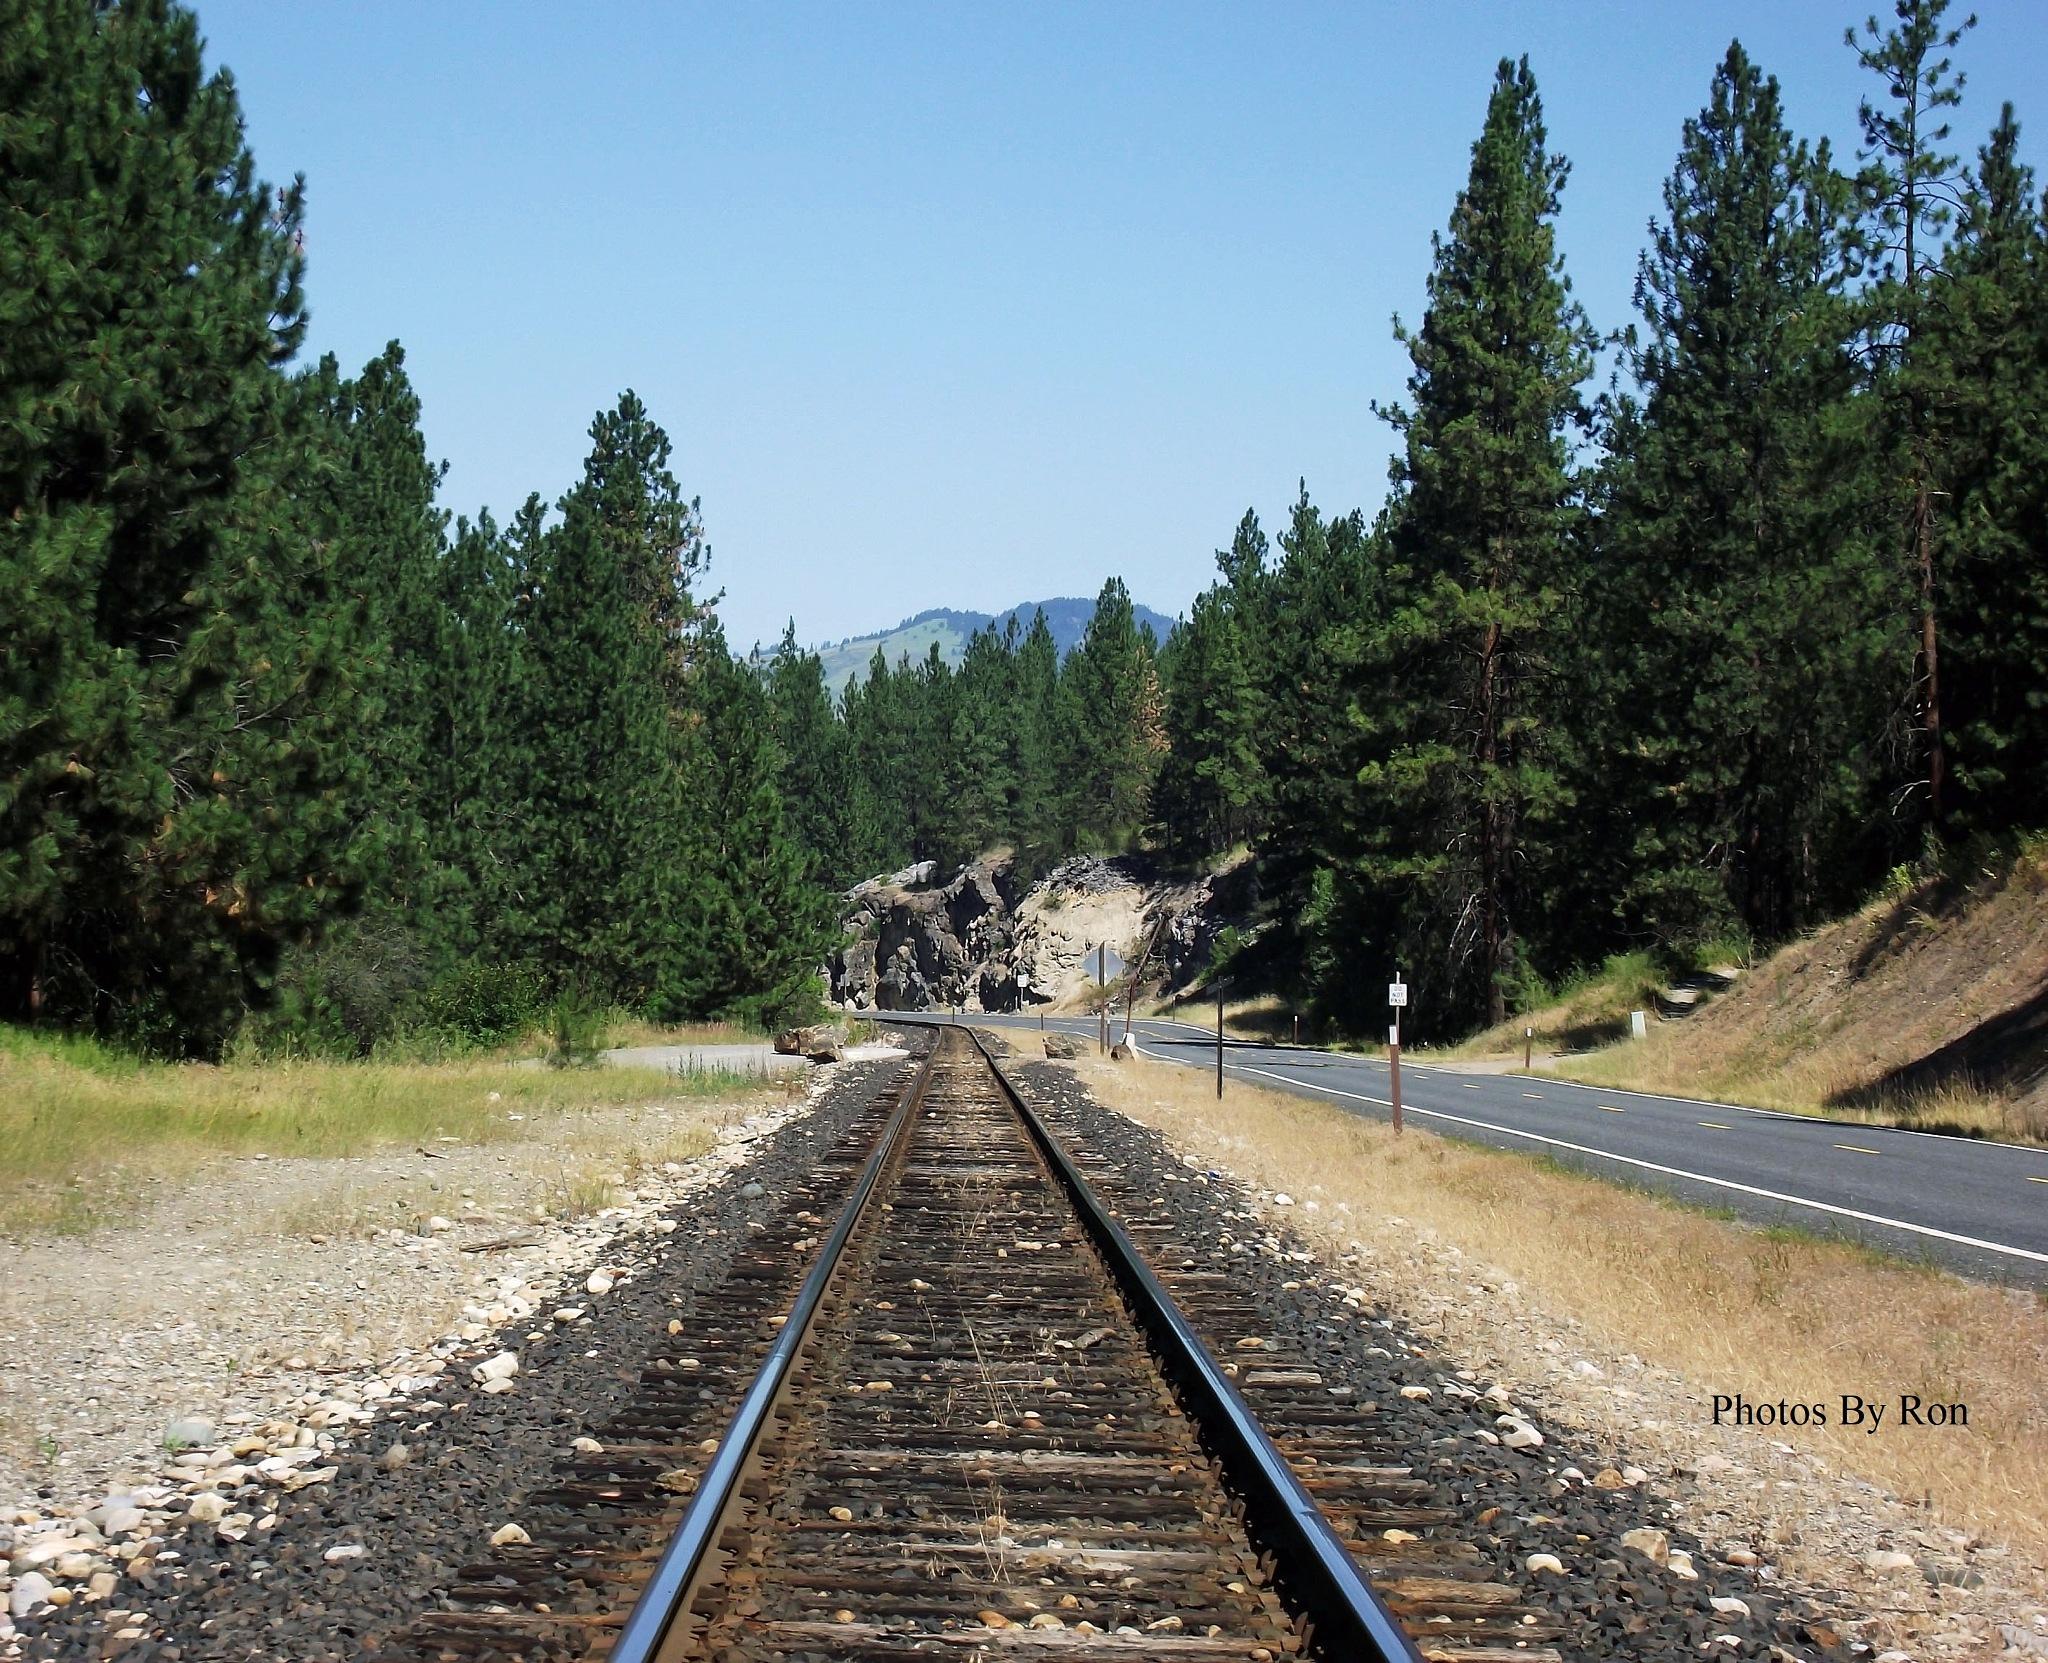 """Tracks"" by Ron Berkley"